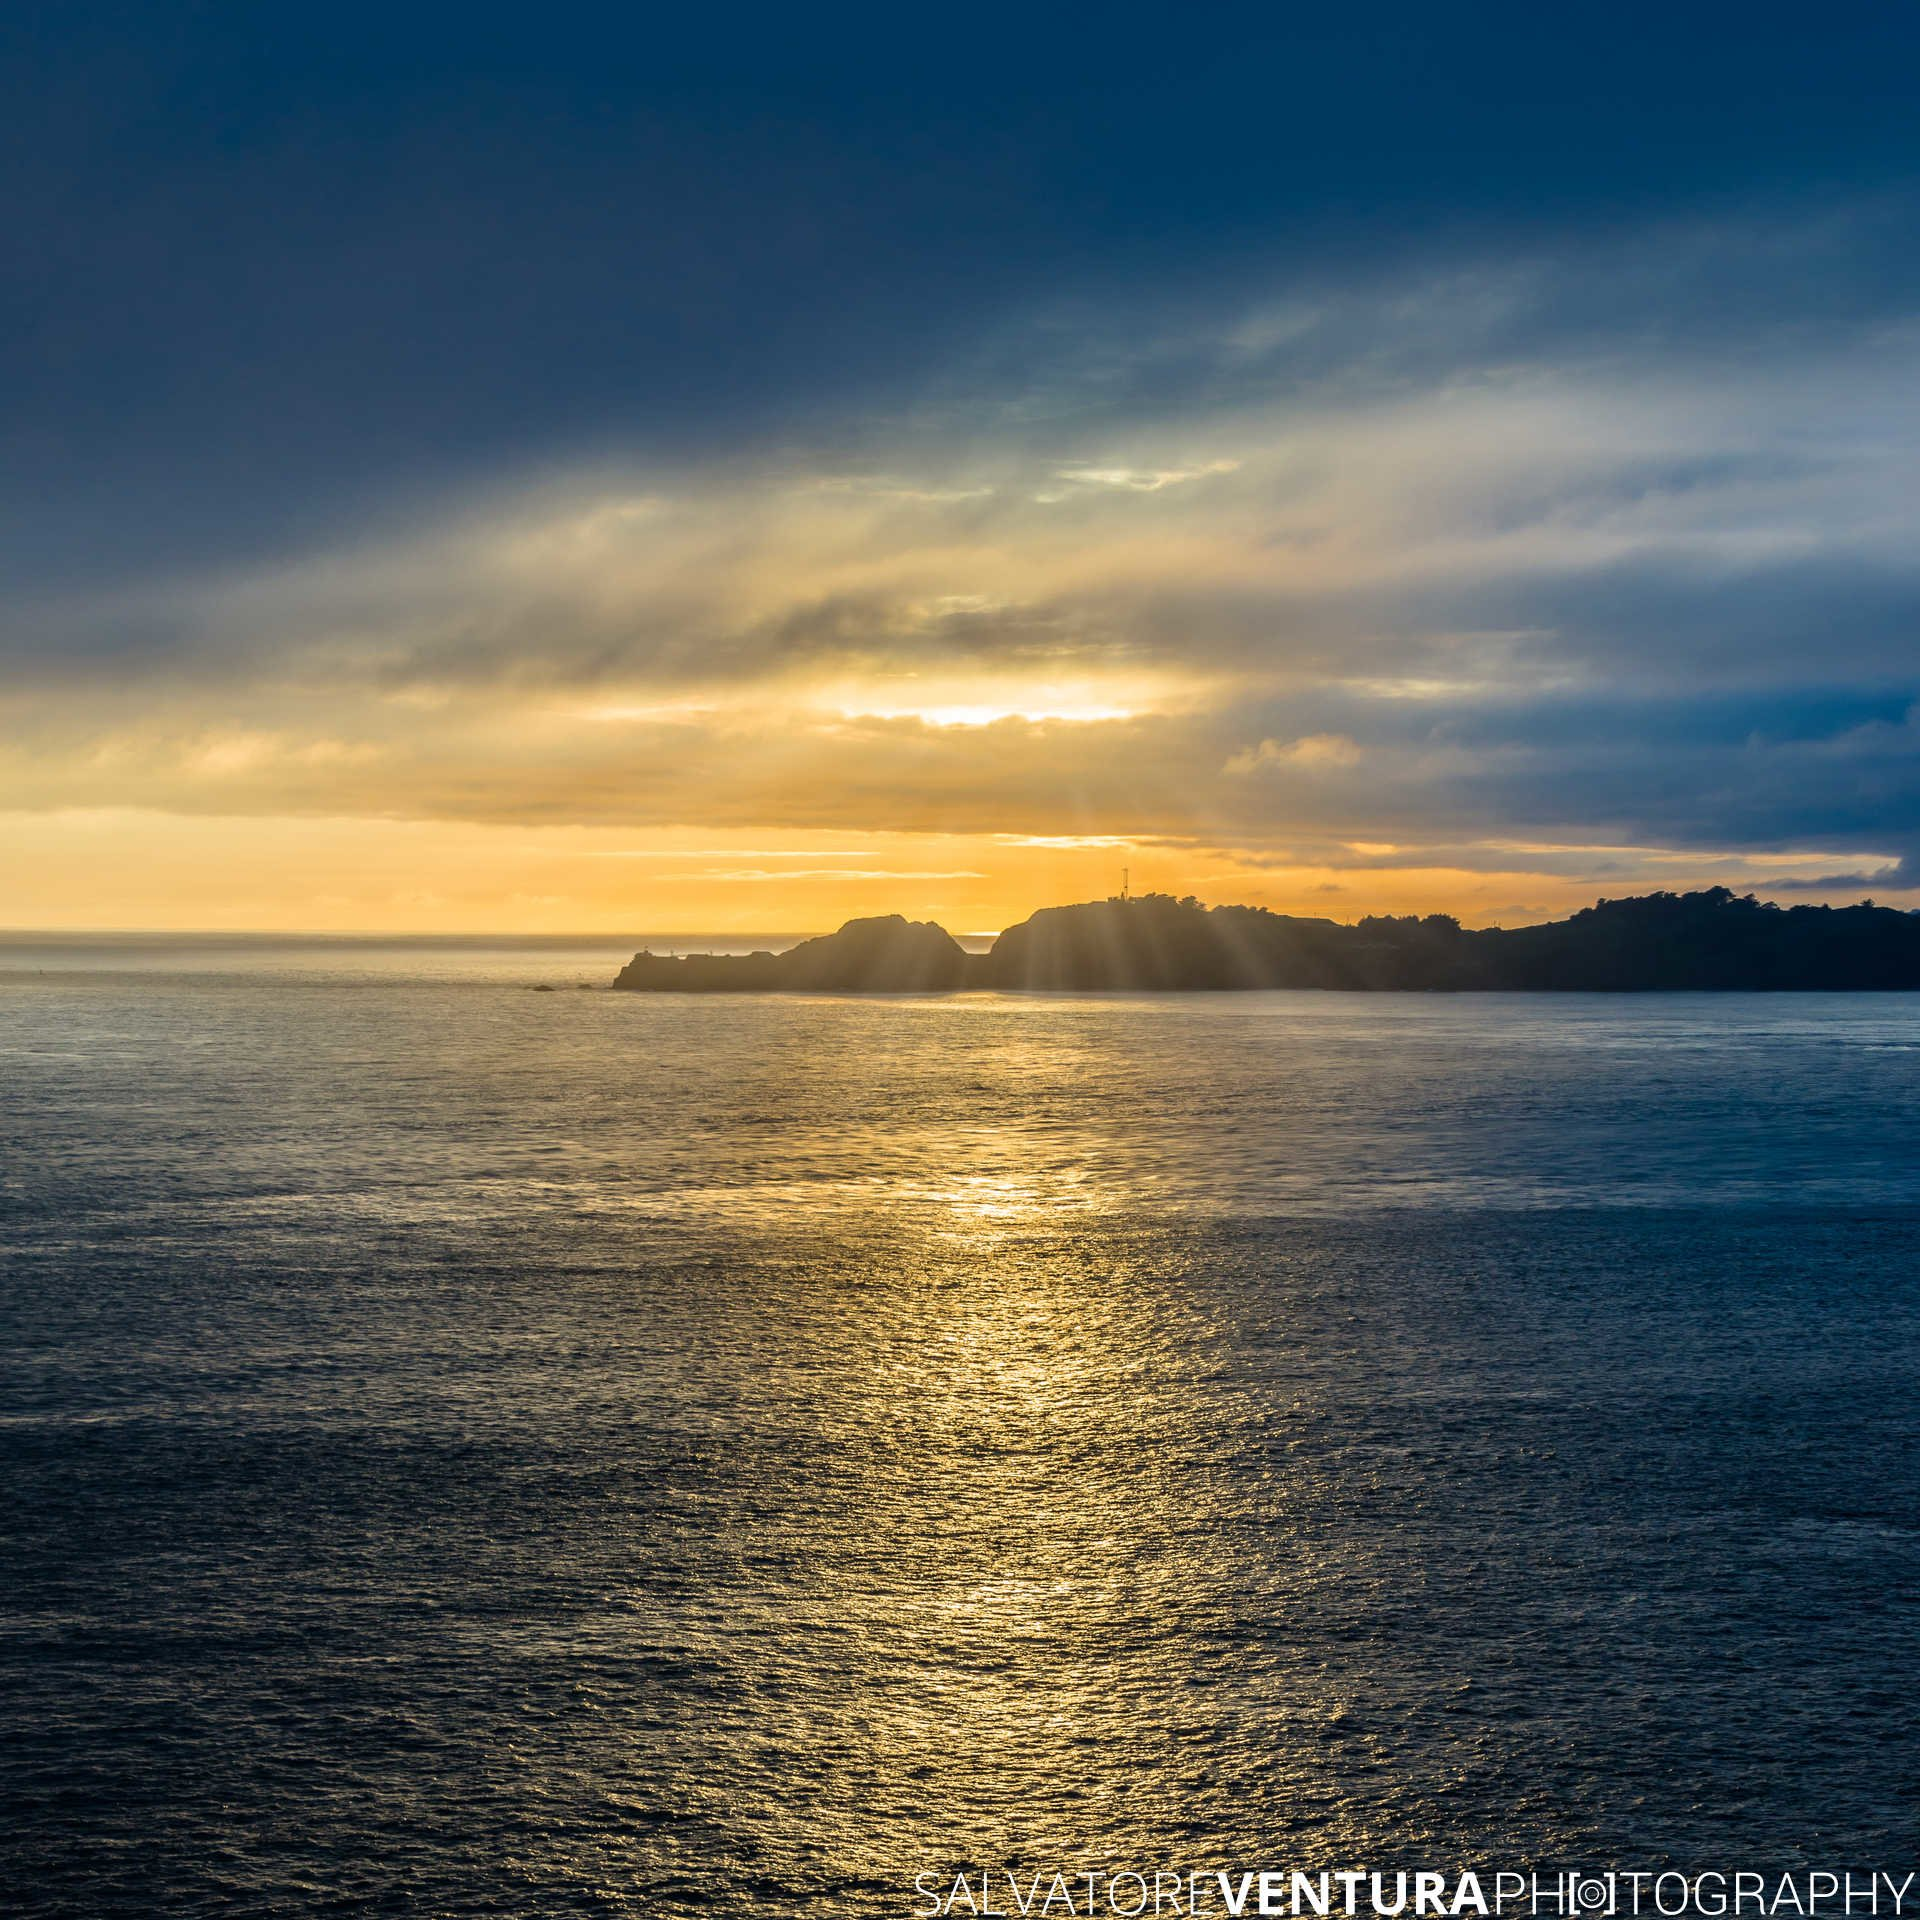 Point Bonita Lighthouse at Sunset (yellow/blue tones) - Salvatore Ventura Ph[o]tography